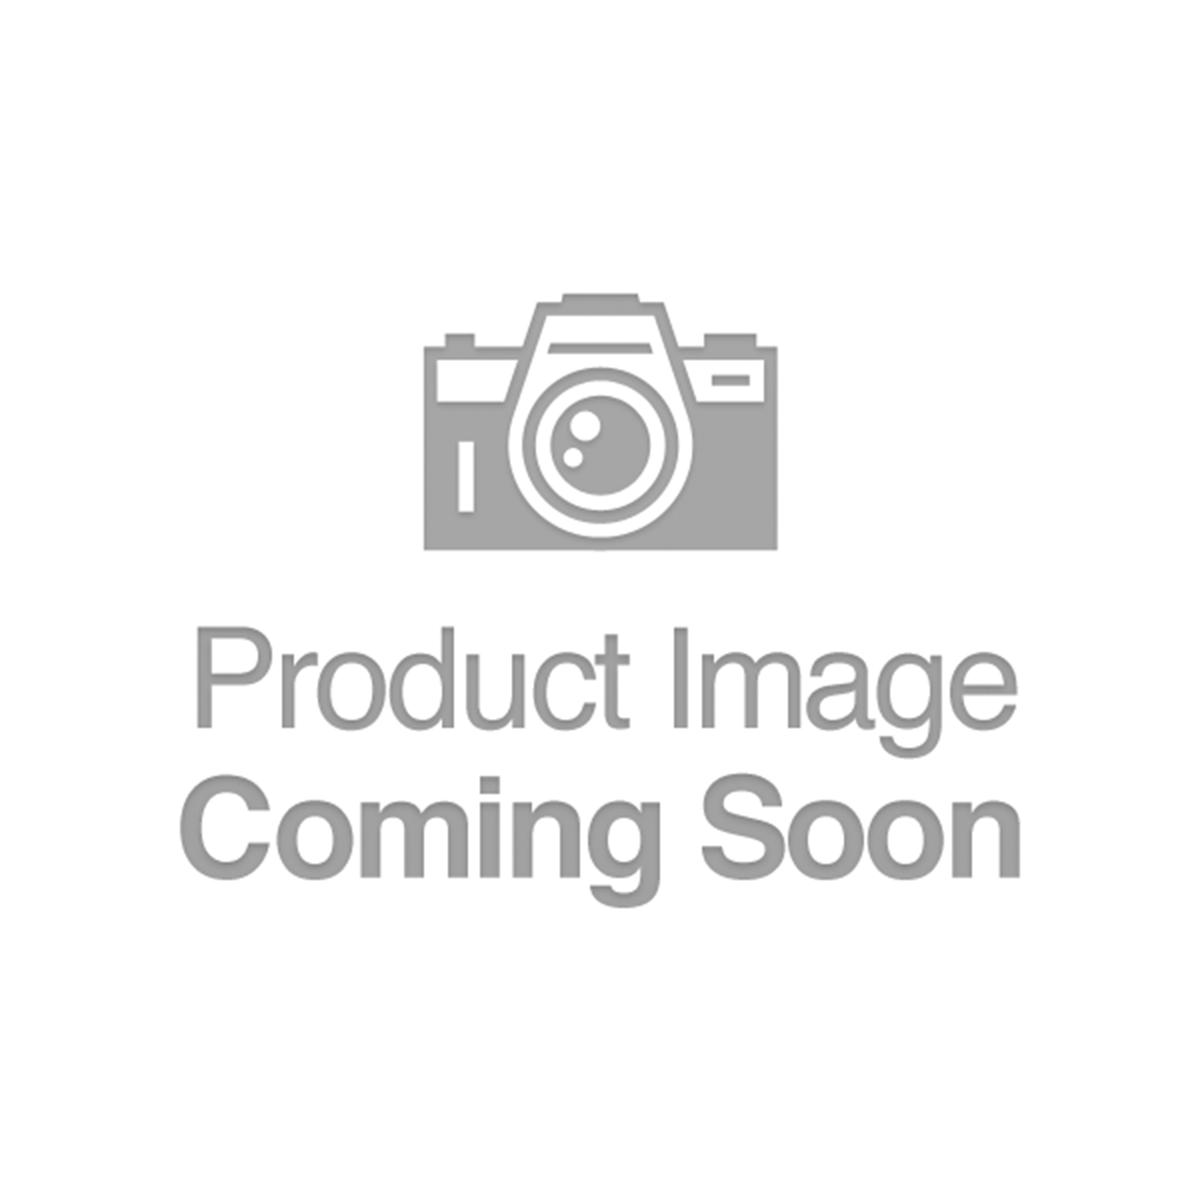 Chilhowie - Virginia - CH 8875 - FR 626 - PMG 25